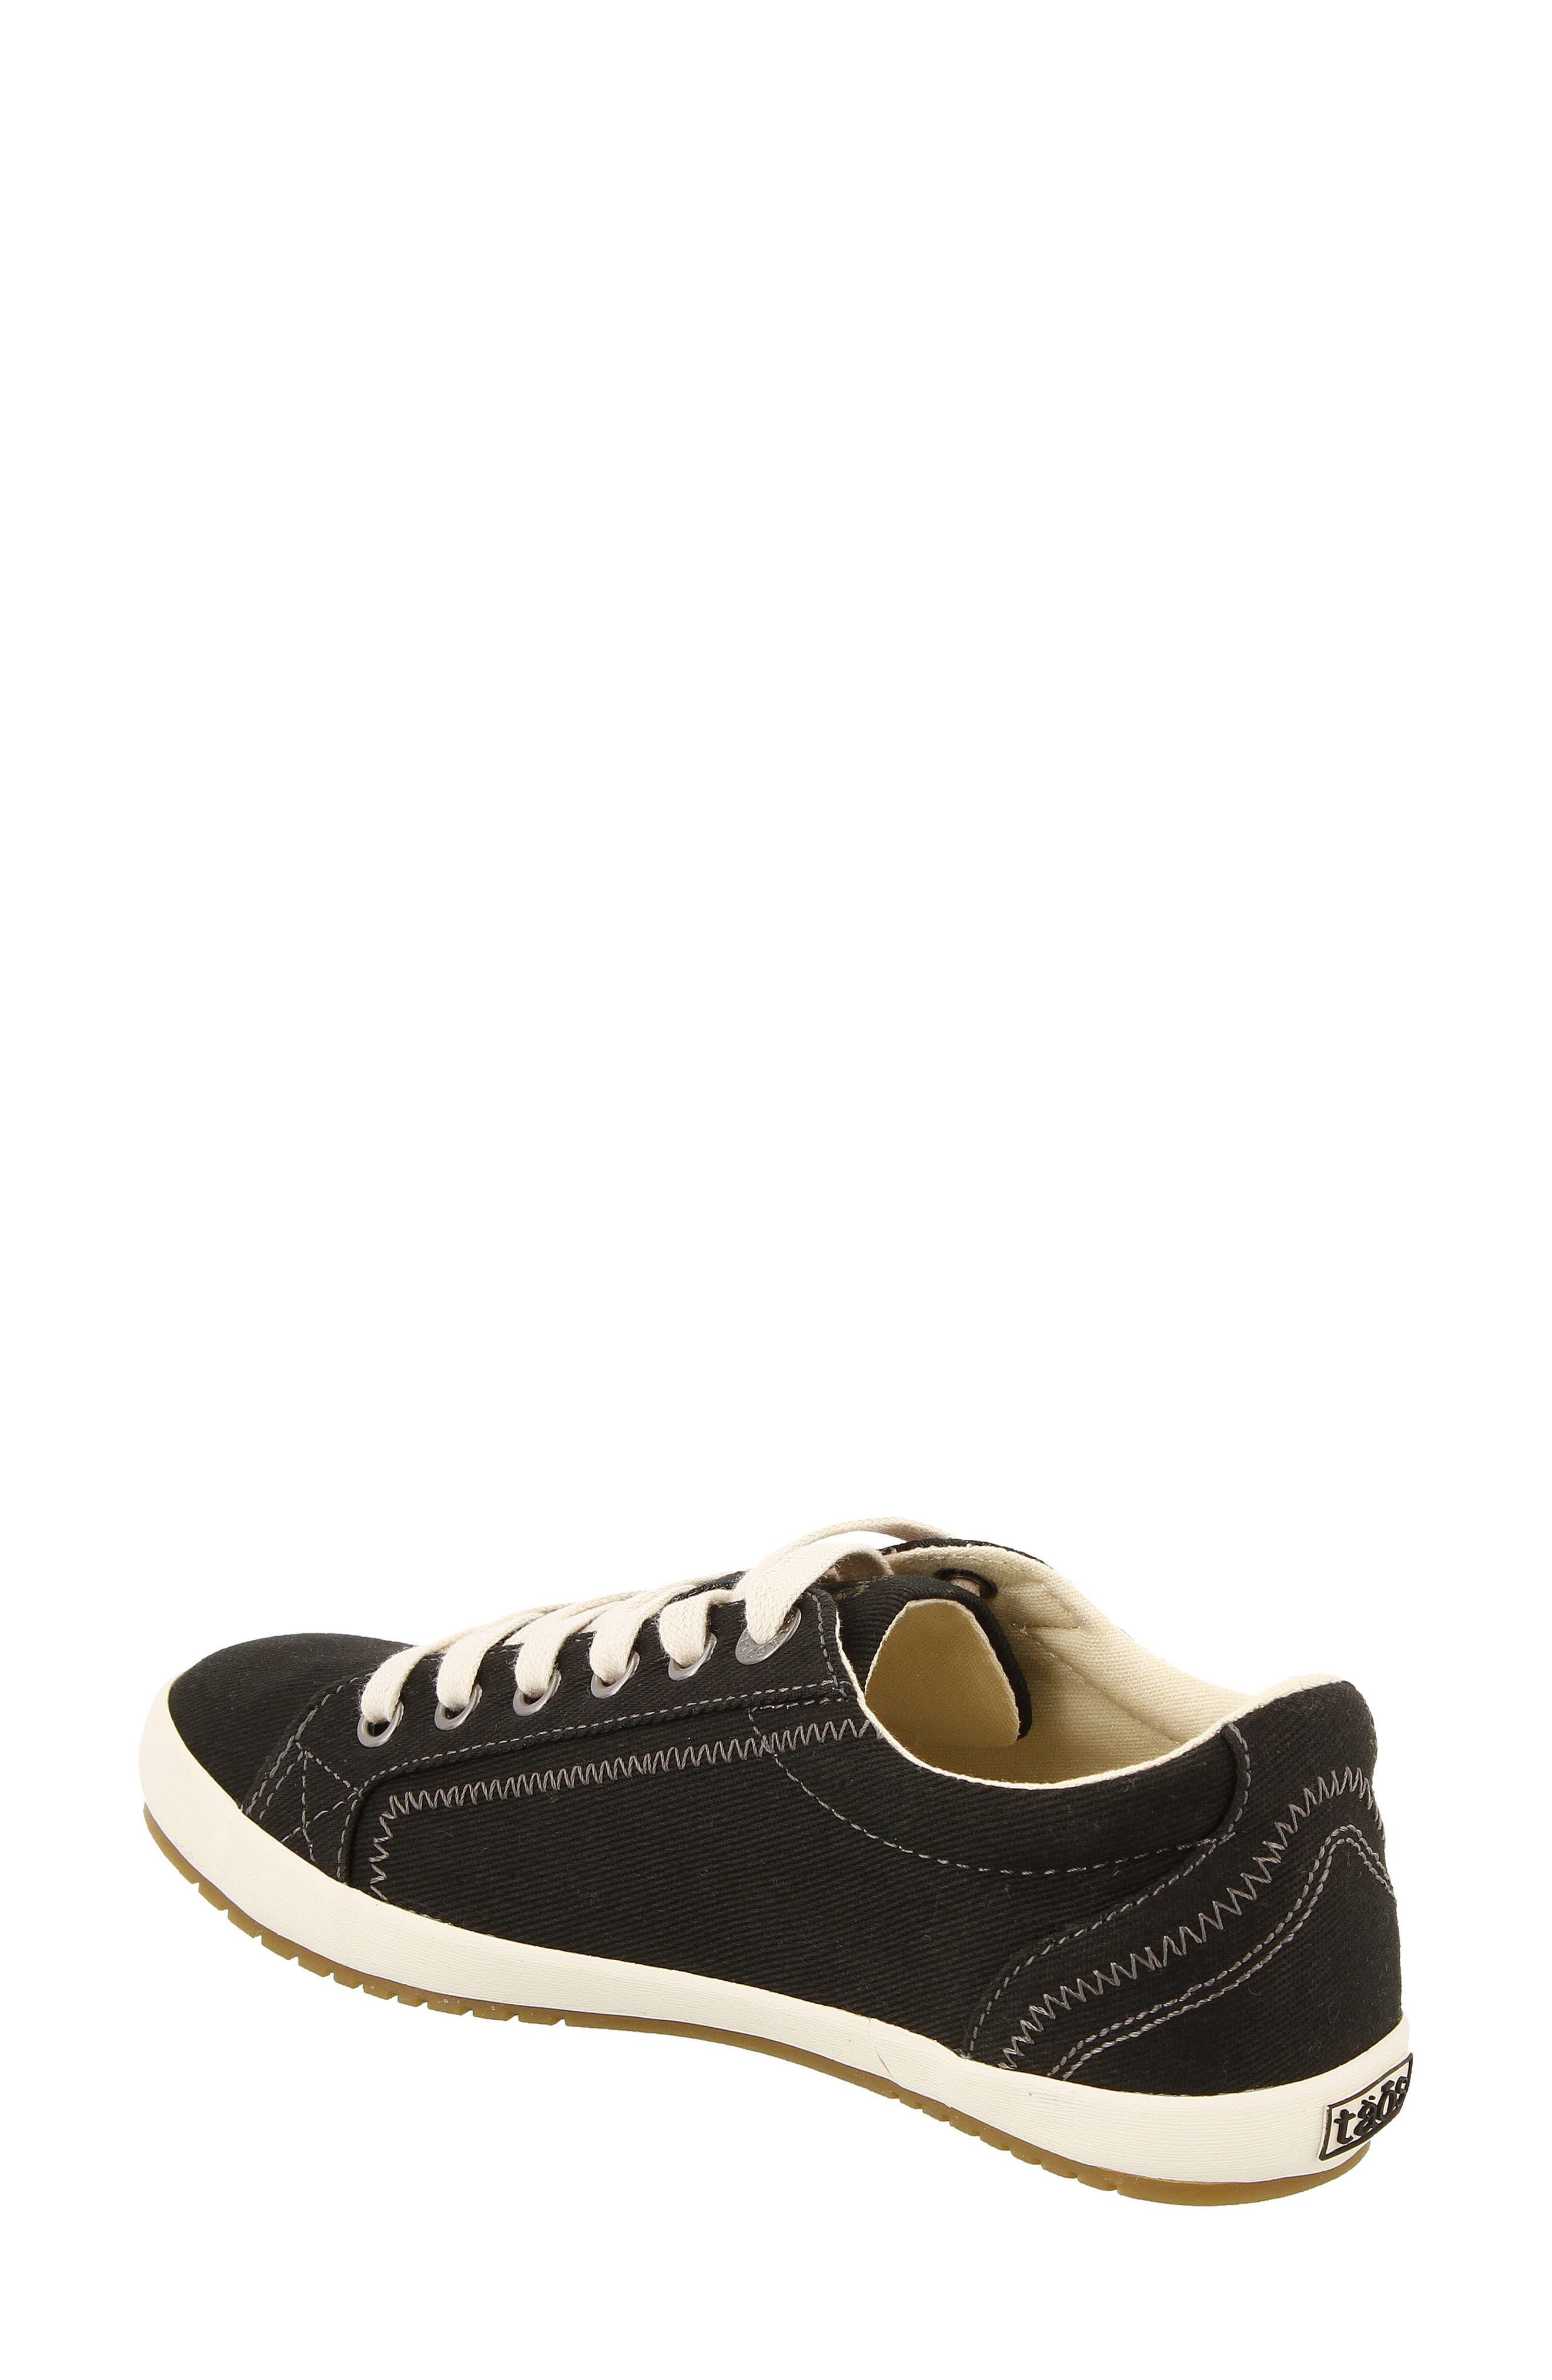 'Star' Sneaker,                             Alternate thumbnail 2, color,                             BLACK CANVAS